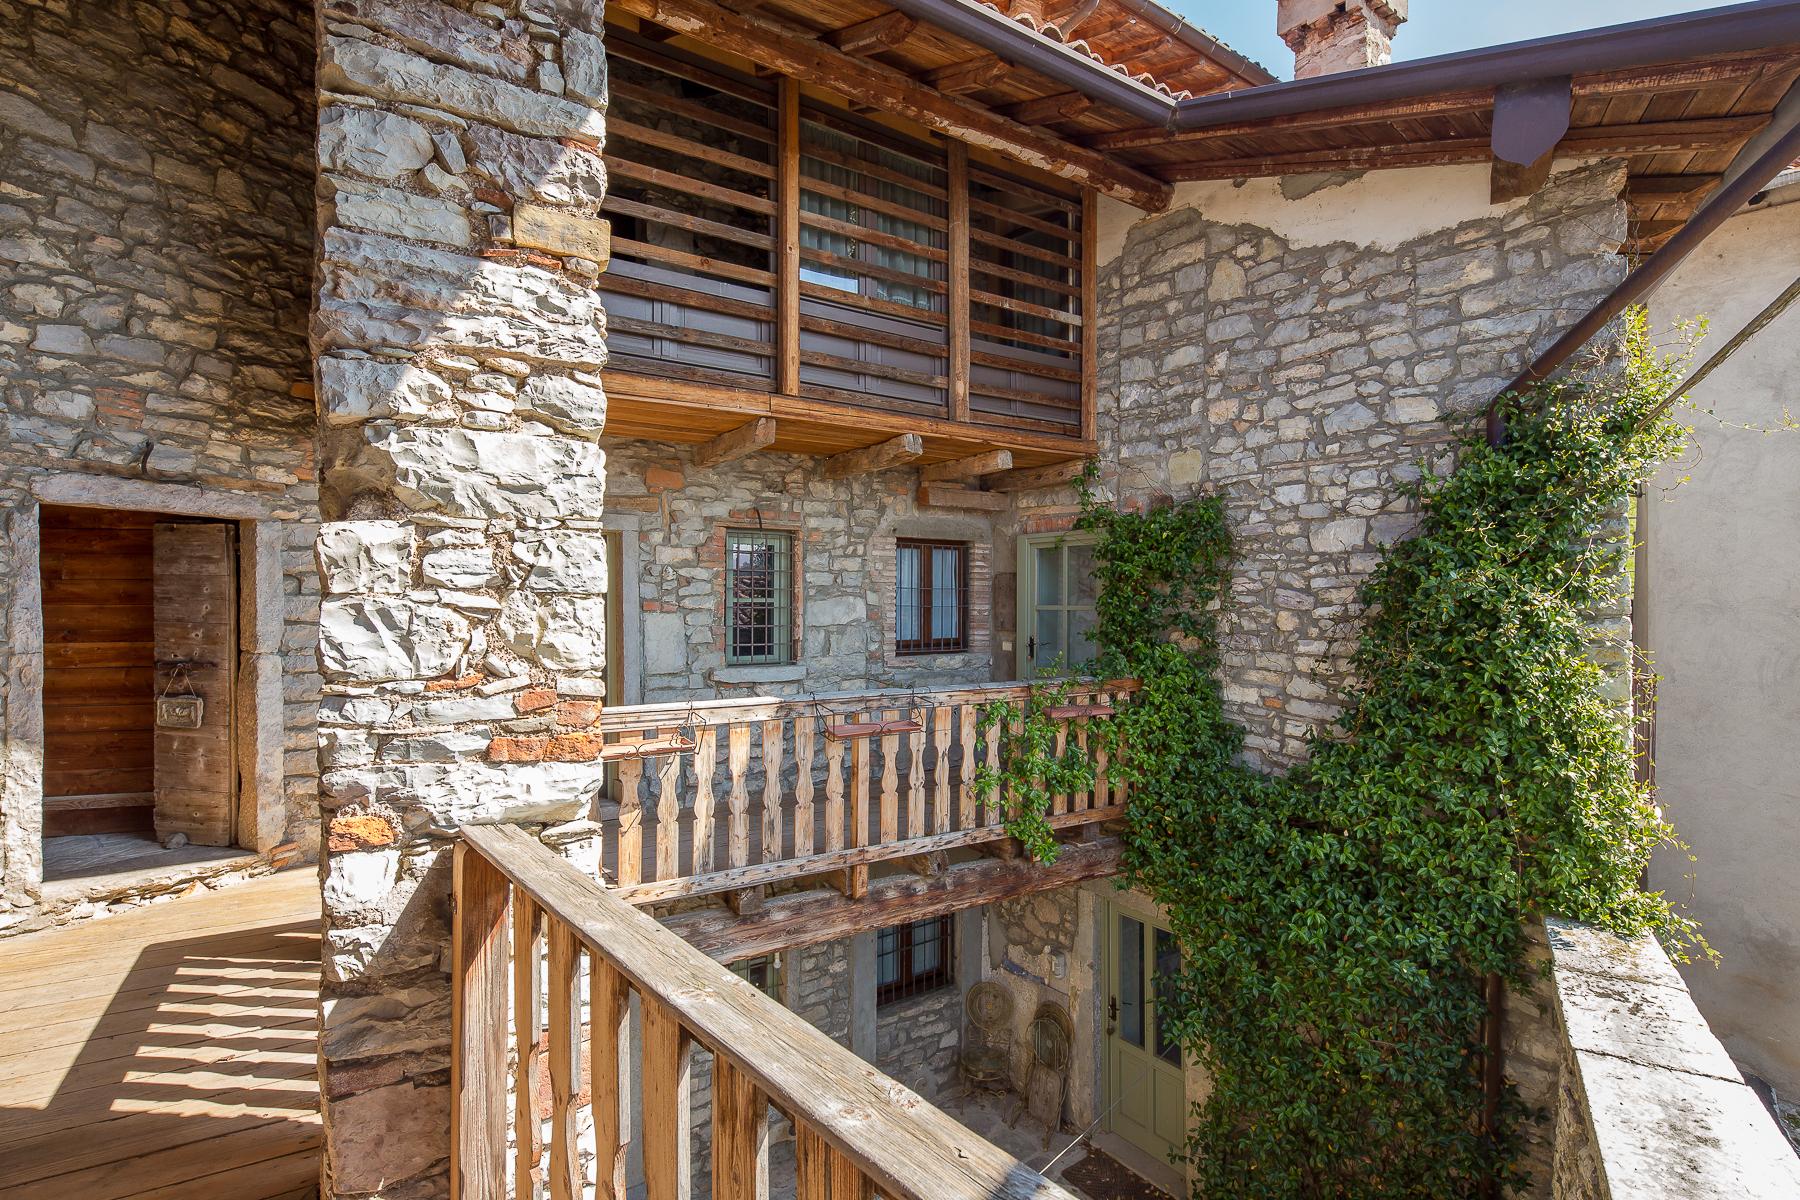 Casa indipendente in Vendita a Caprino Bergamasco: 5 locali, 500 mq - Foto 13